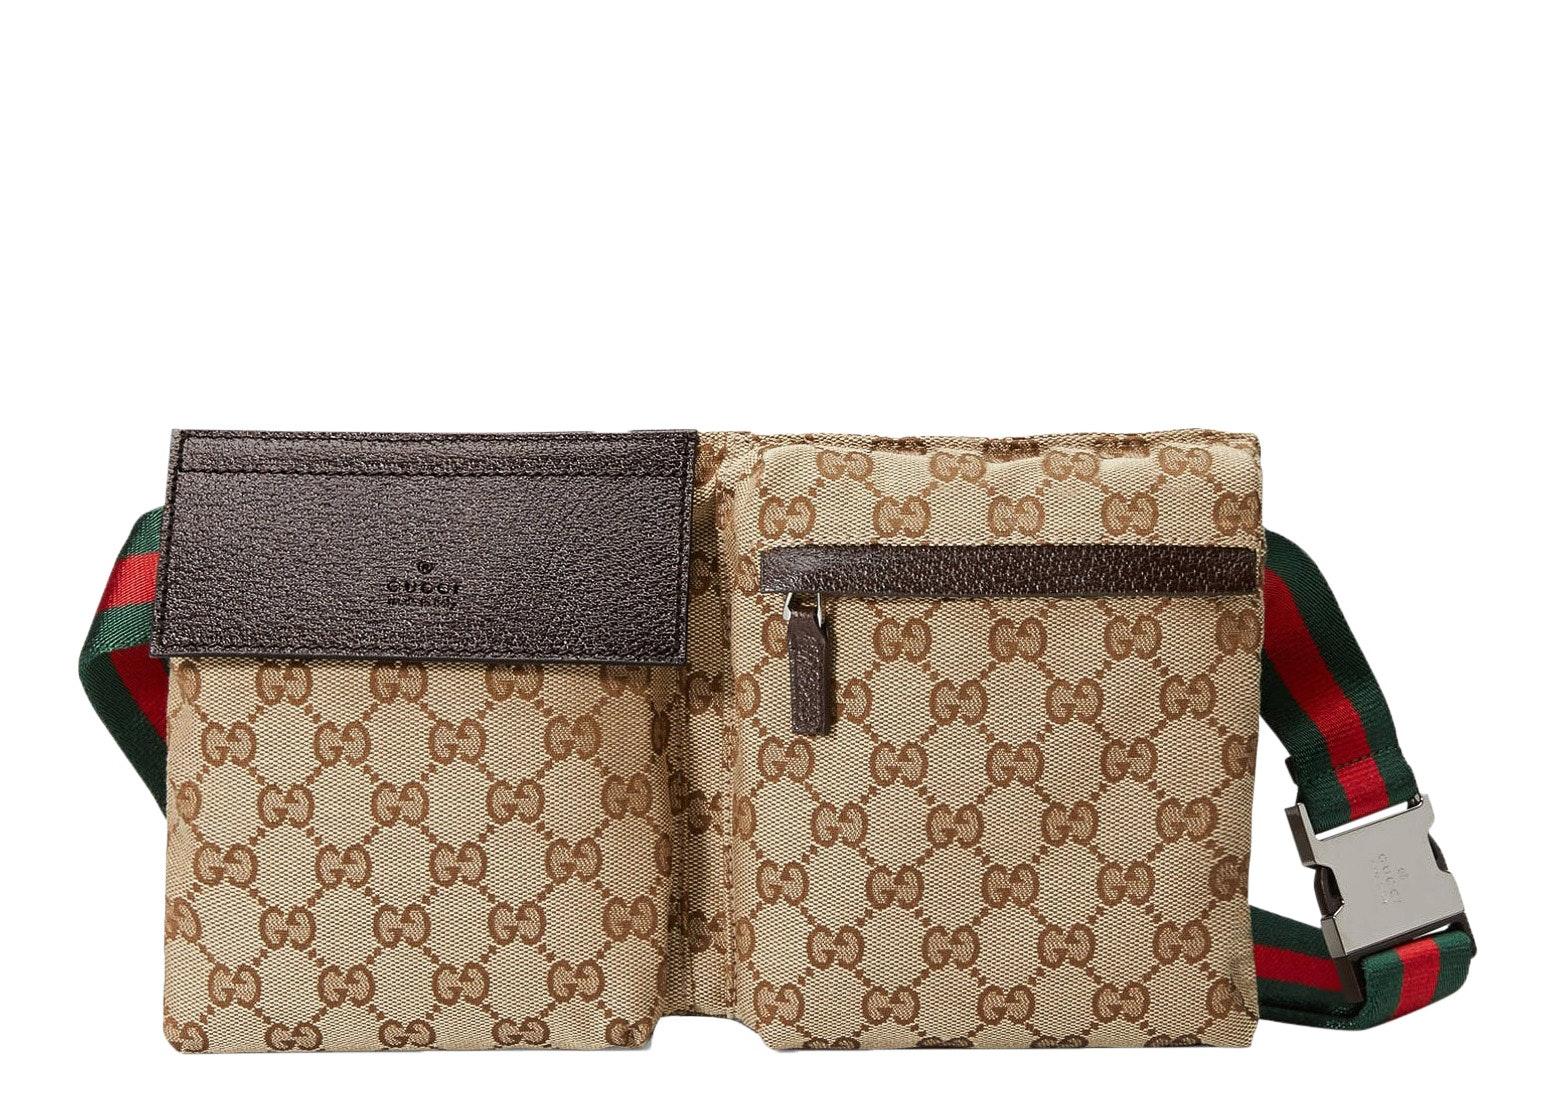 Gucci Waist Bag GG Supreme Web Strap Beige